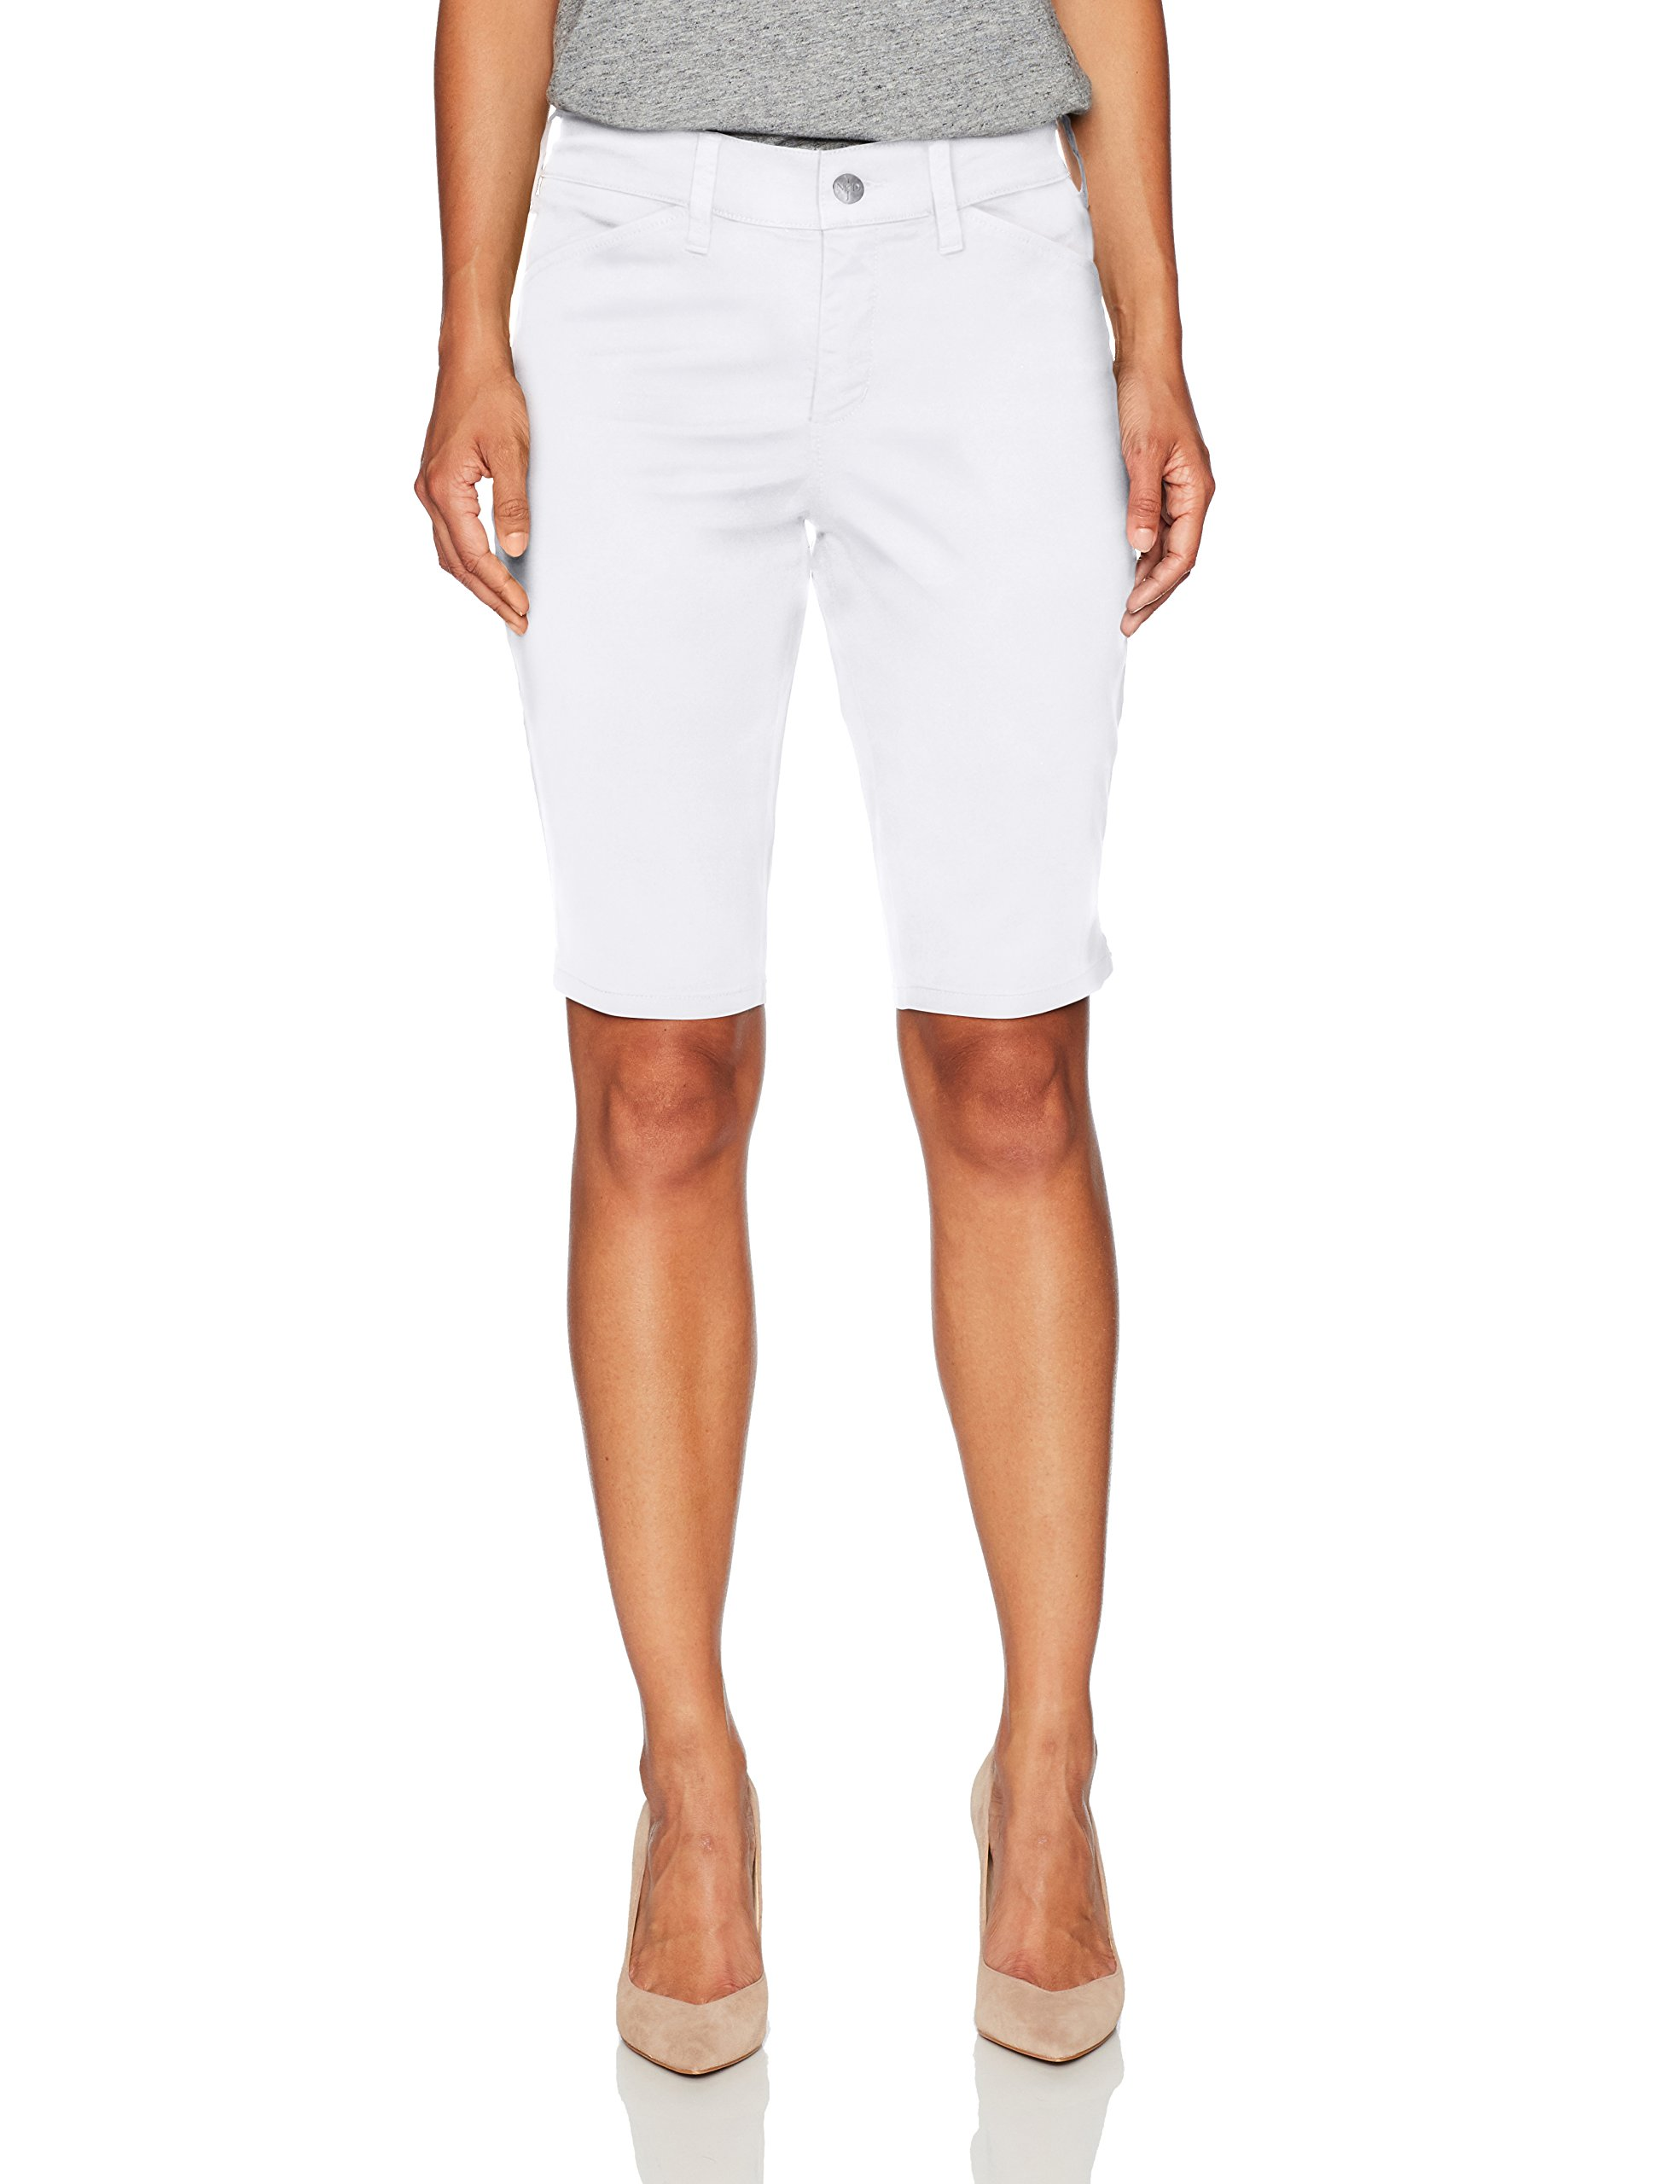 NYDJ Women's Petite Size Christy Chino Twill Bermuda Short, Optic White, 0P by NYDJ